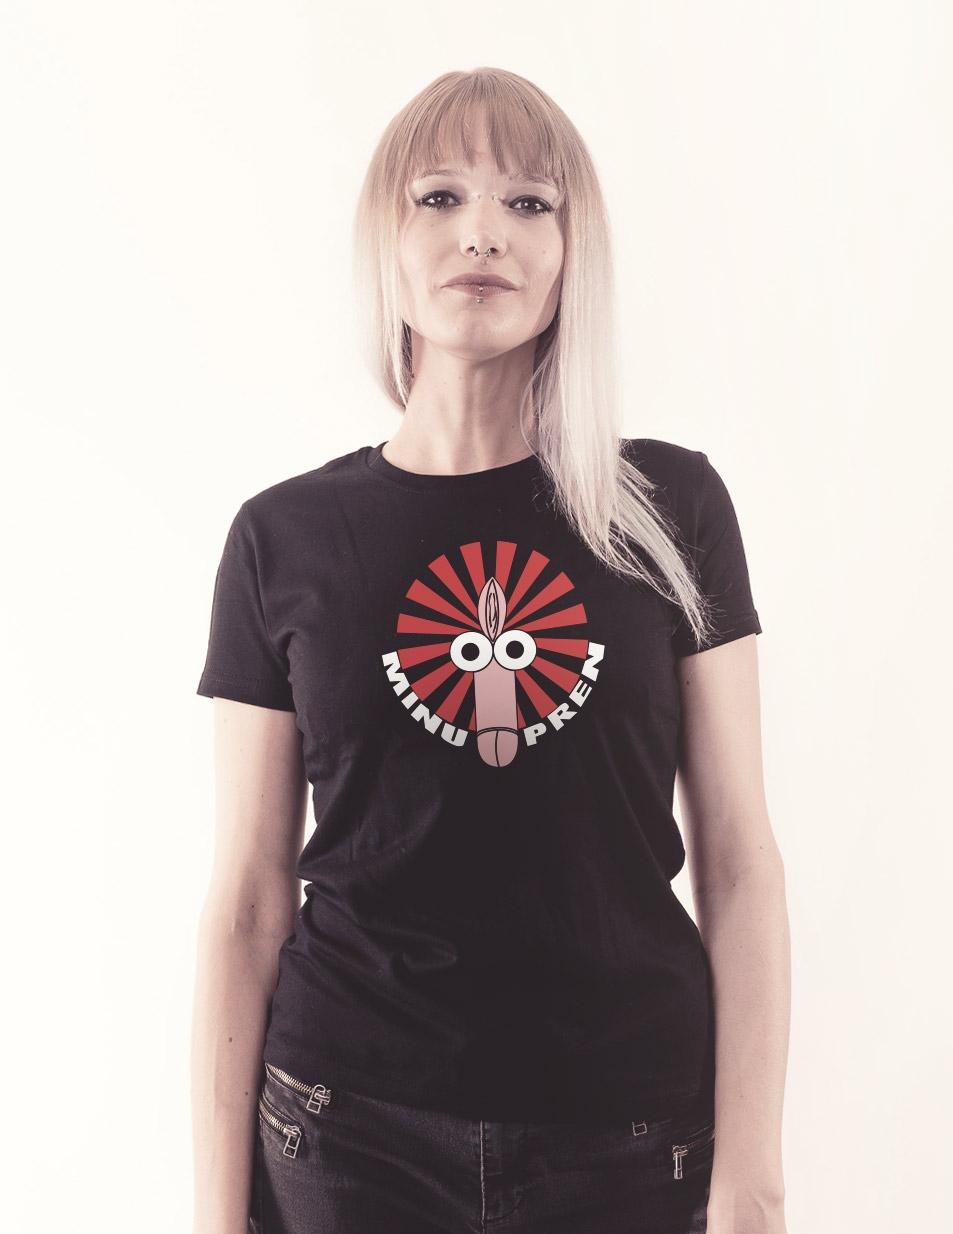 Fotzenpimmel Girly Shirt mehrfarbig auf schwarz